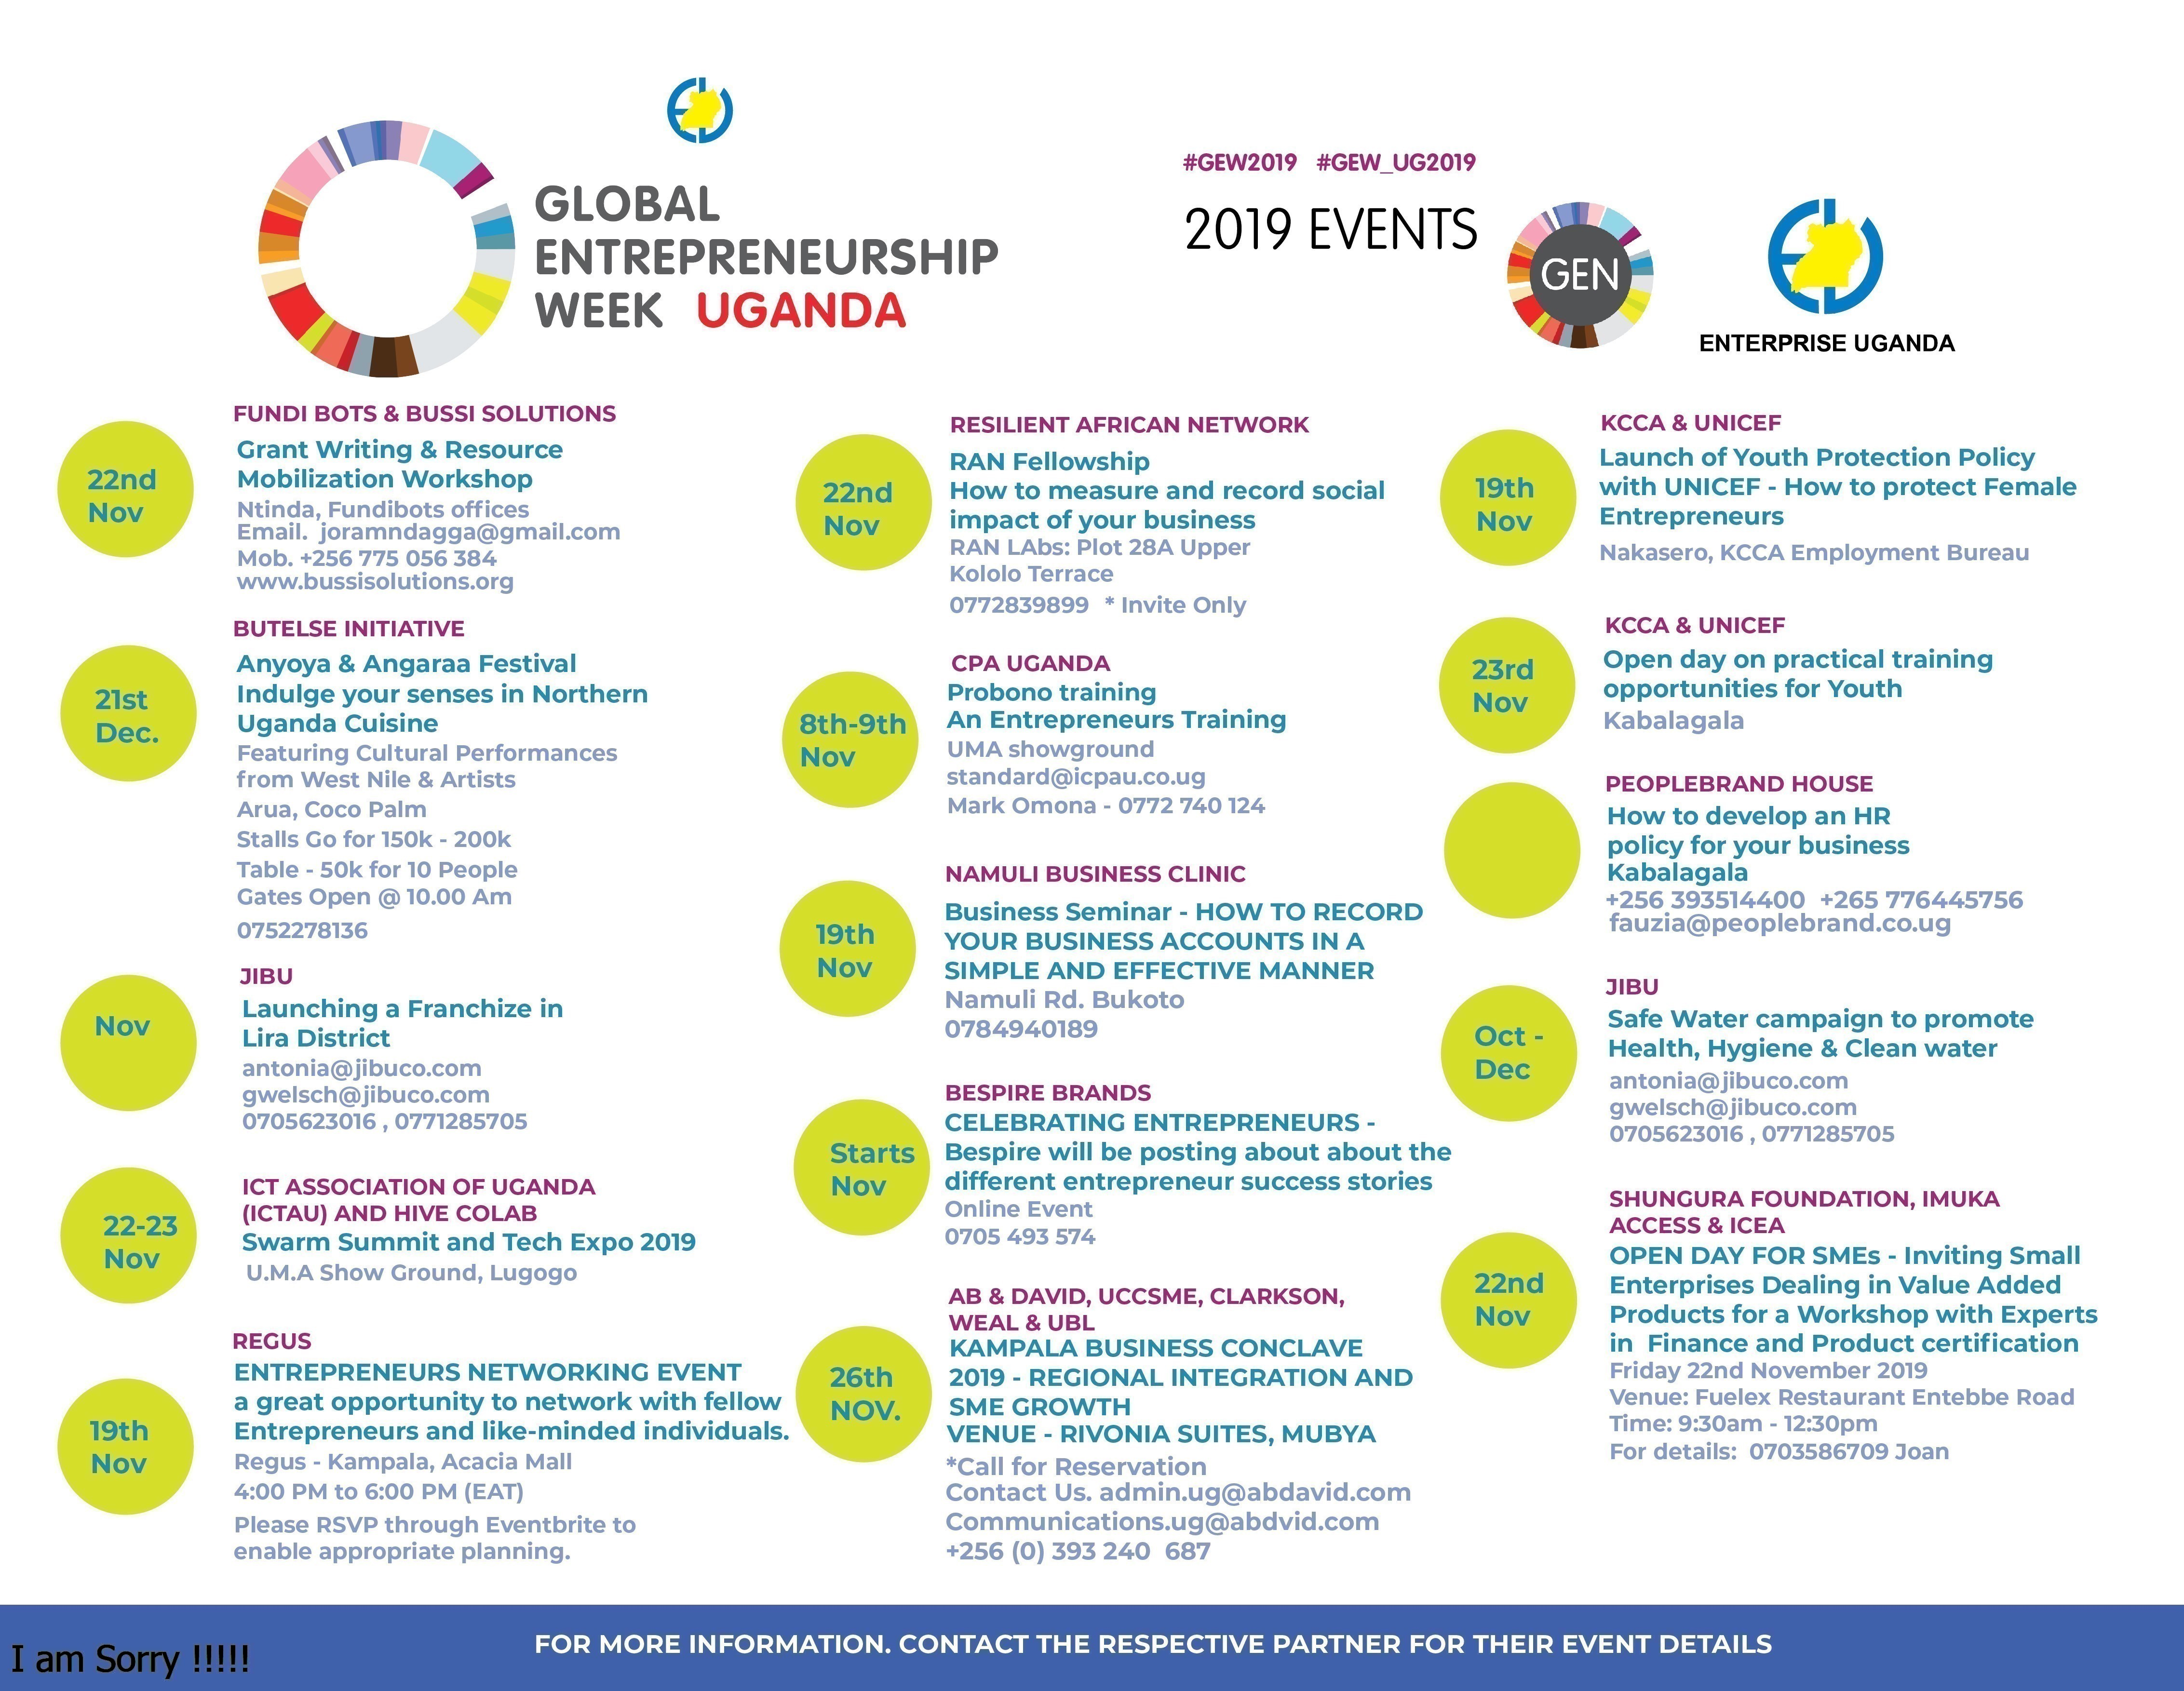 GEW 2019 EVENTS - UGANDA